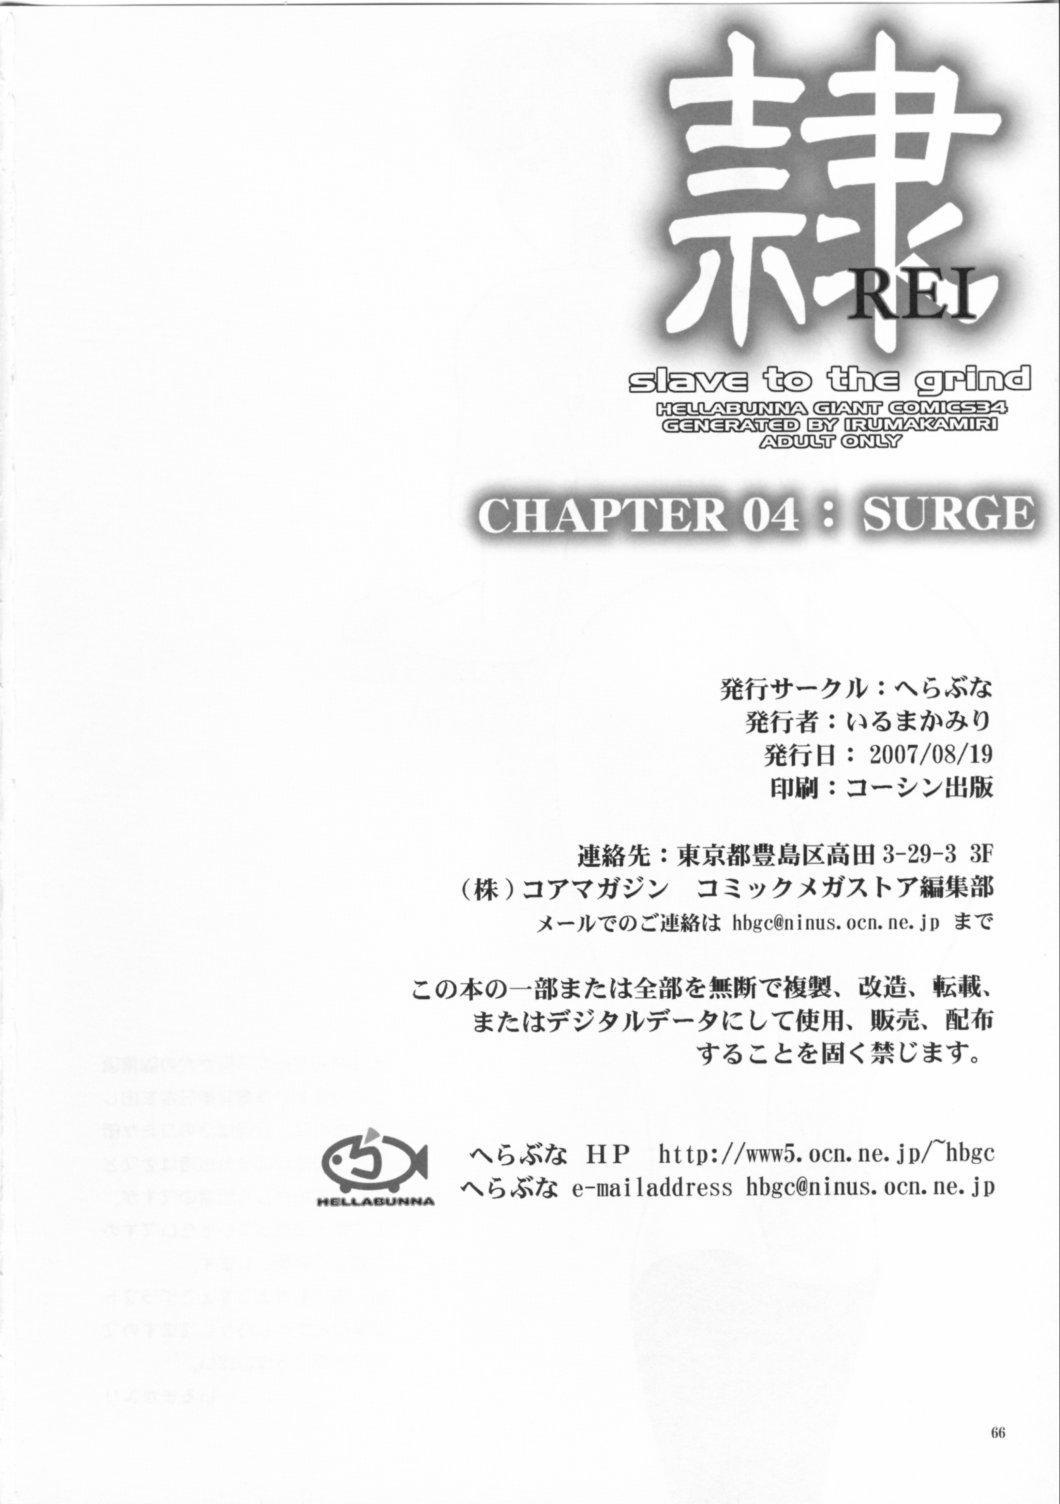 (C72) [Hellabunna (Iruma Kamiri)] REI - slave to the grind - CHAPTER 04: SURGE (Dead or Alive) 64